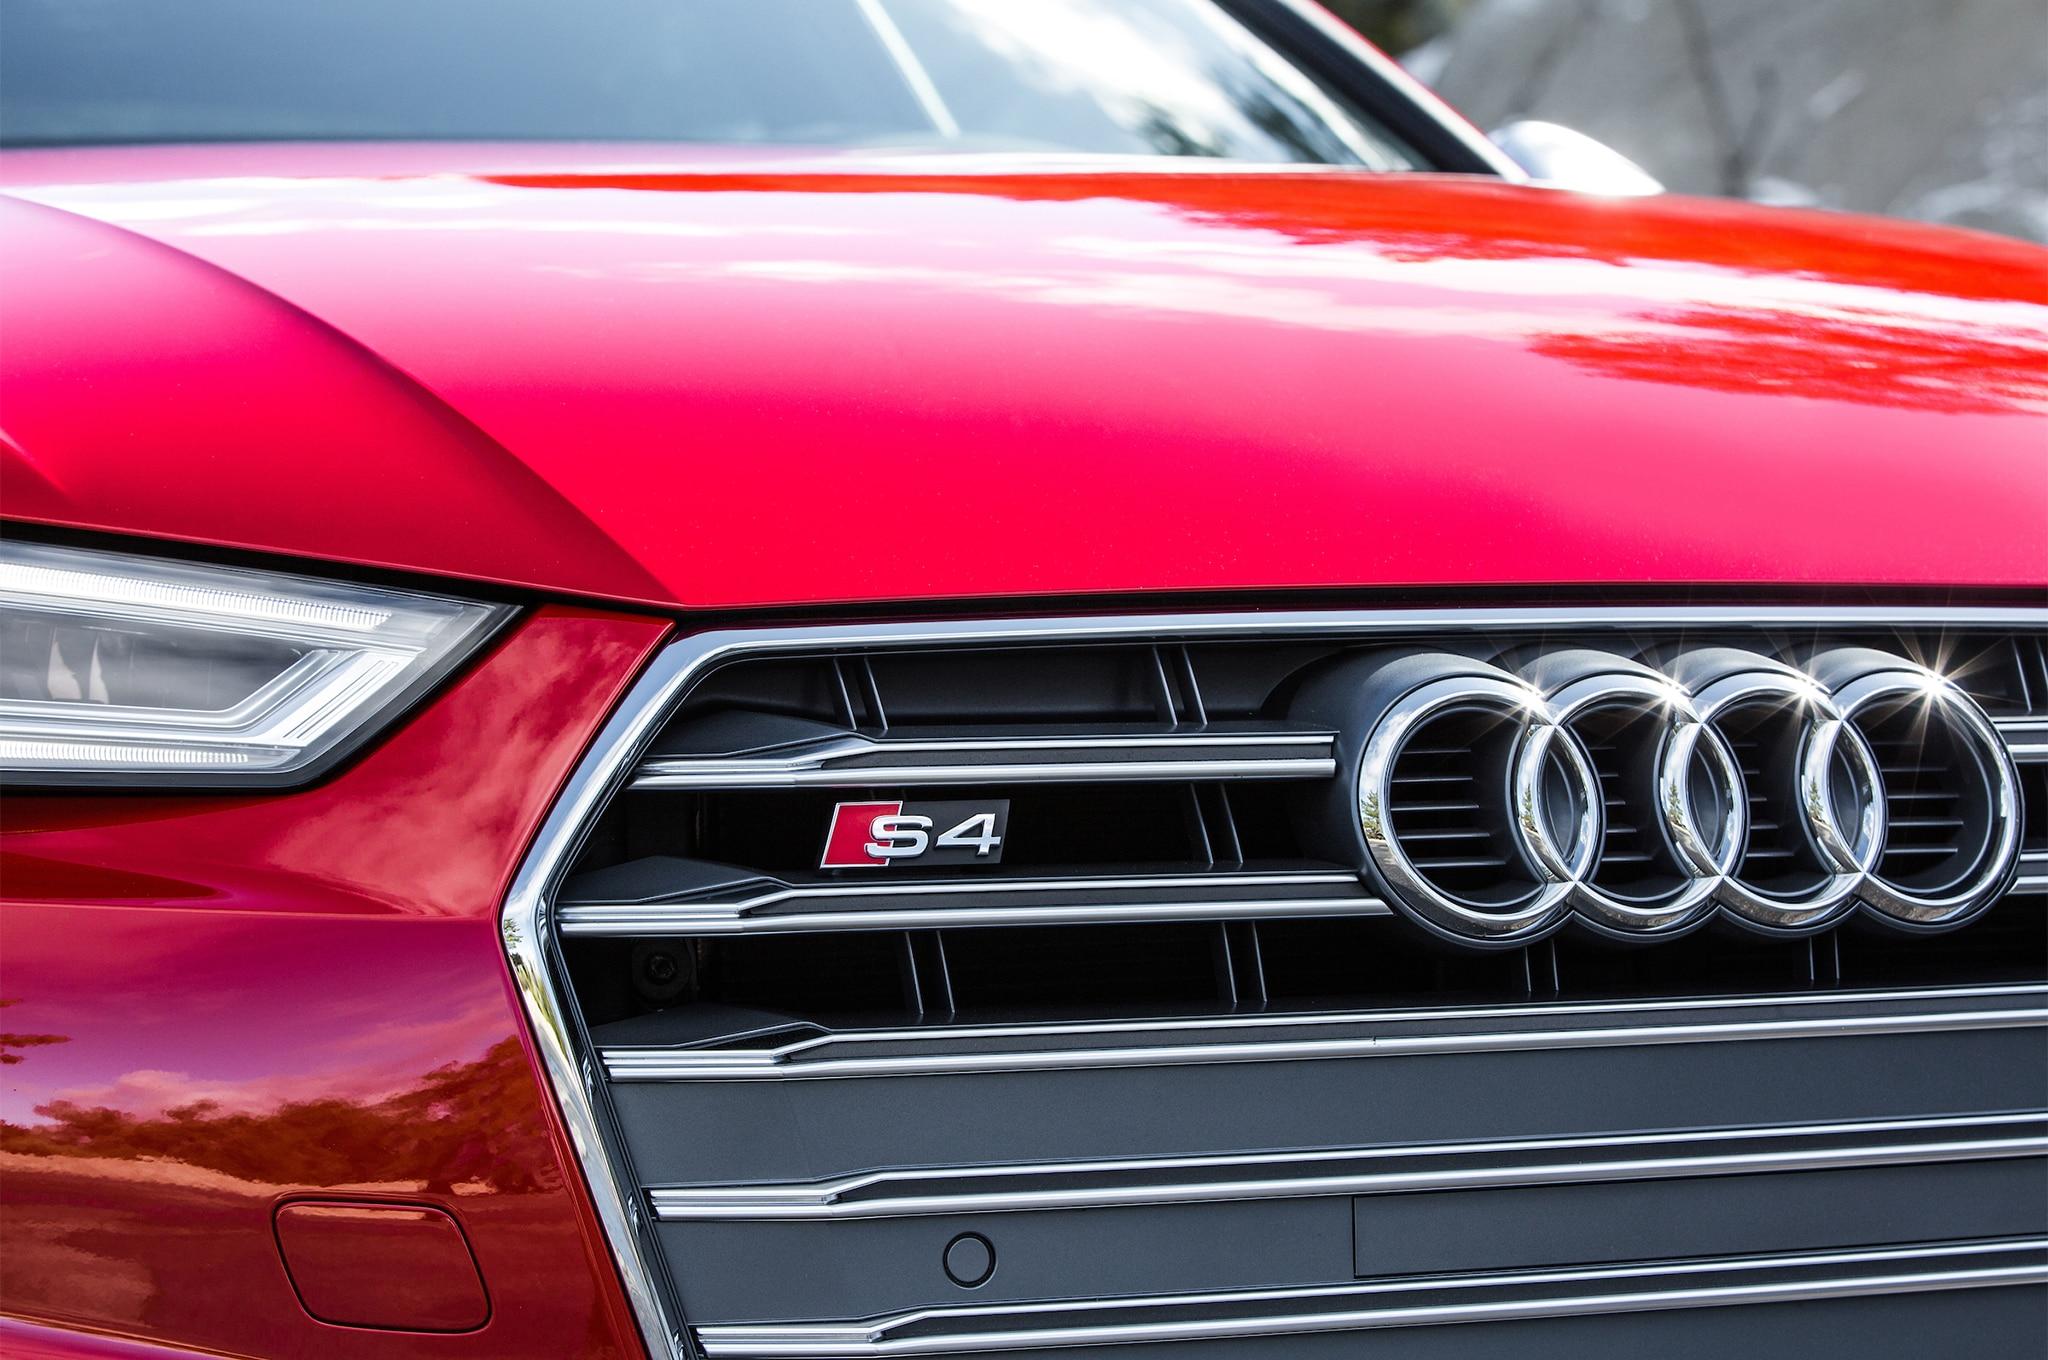 First Drive: 2018 Audi S4 | Automobile Magazine